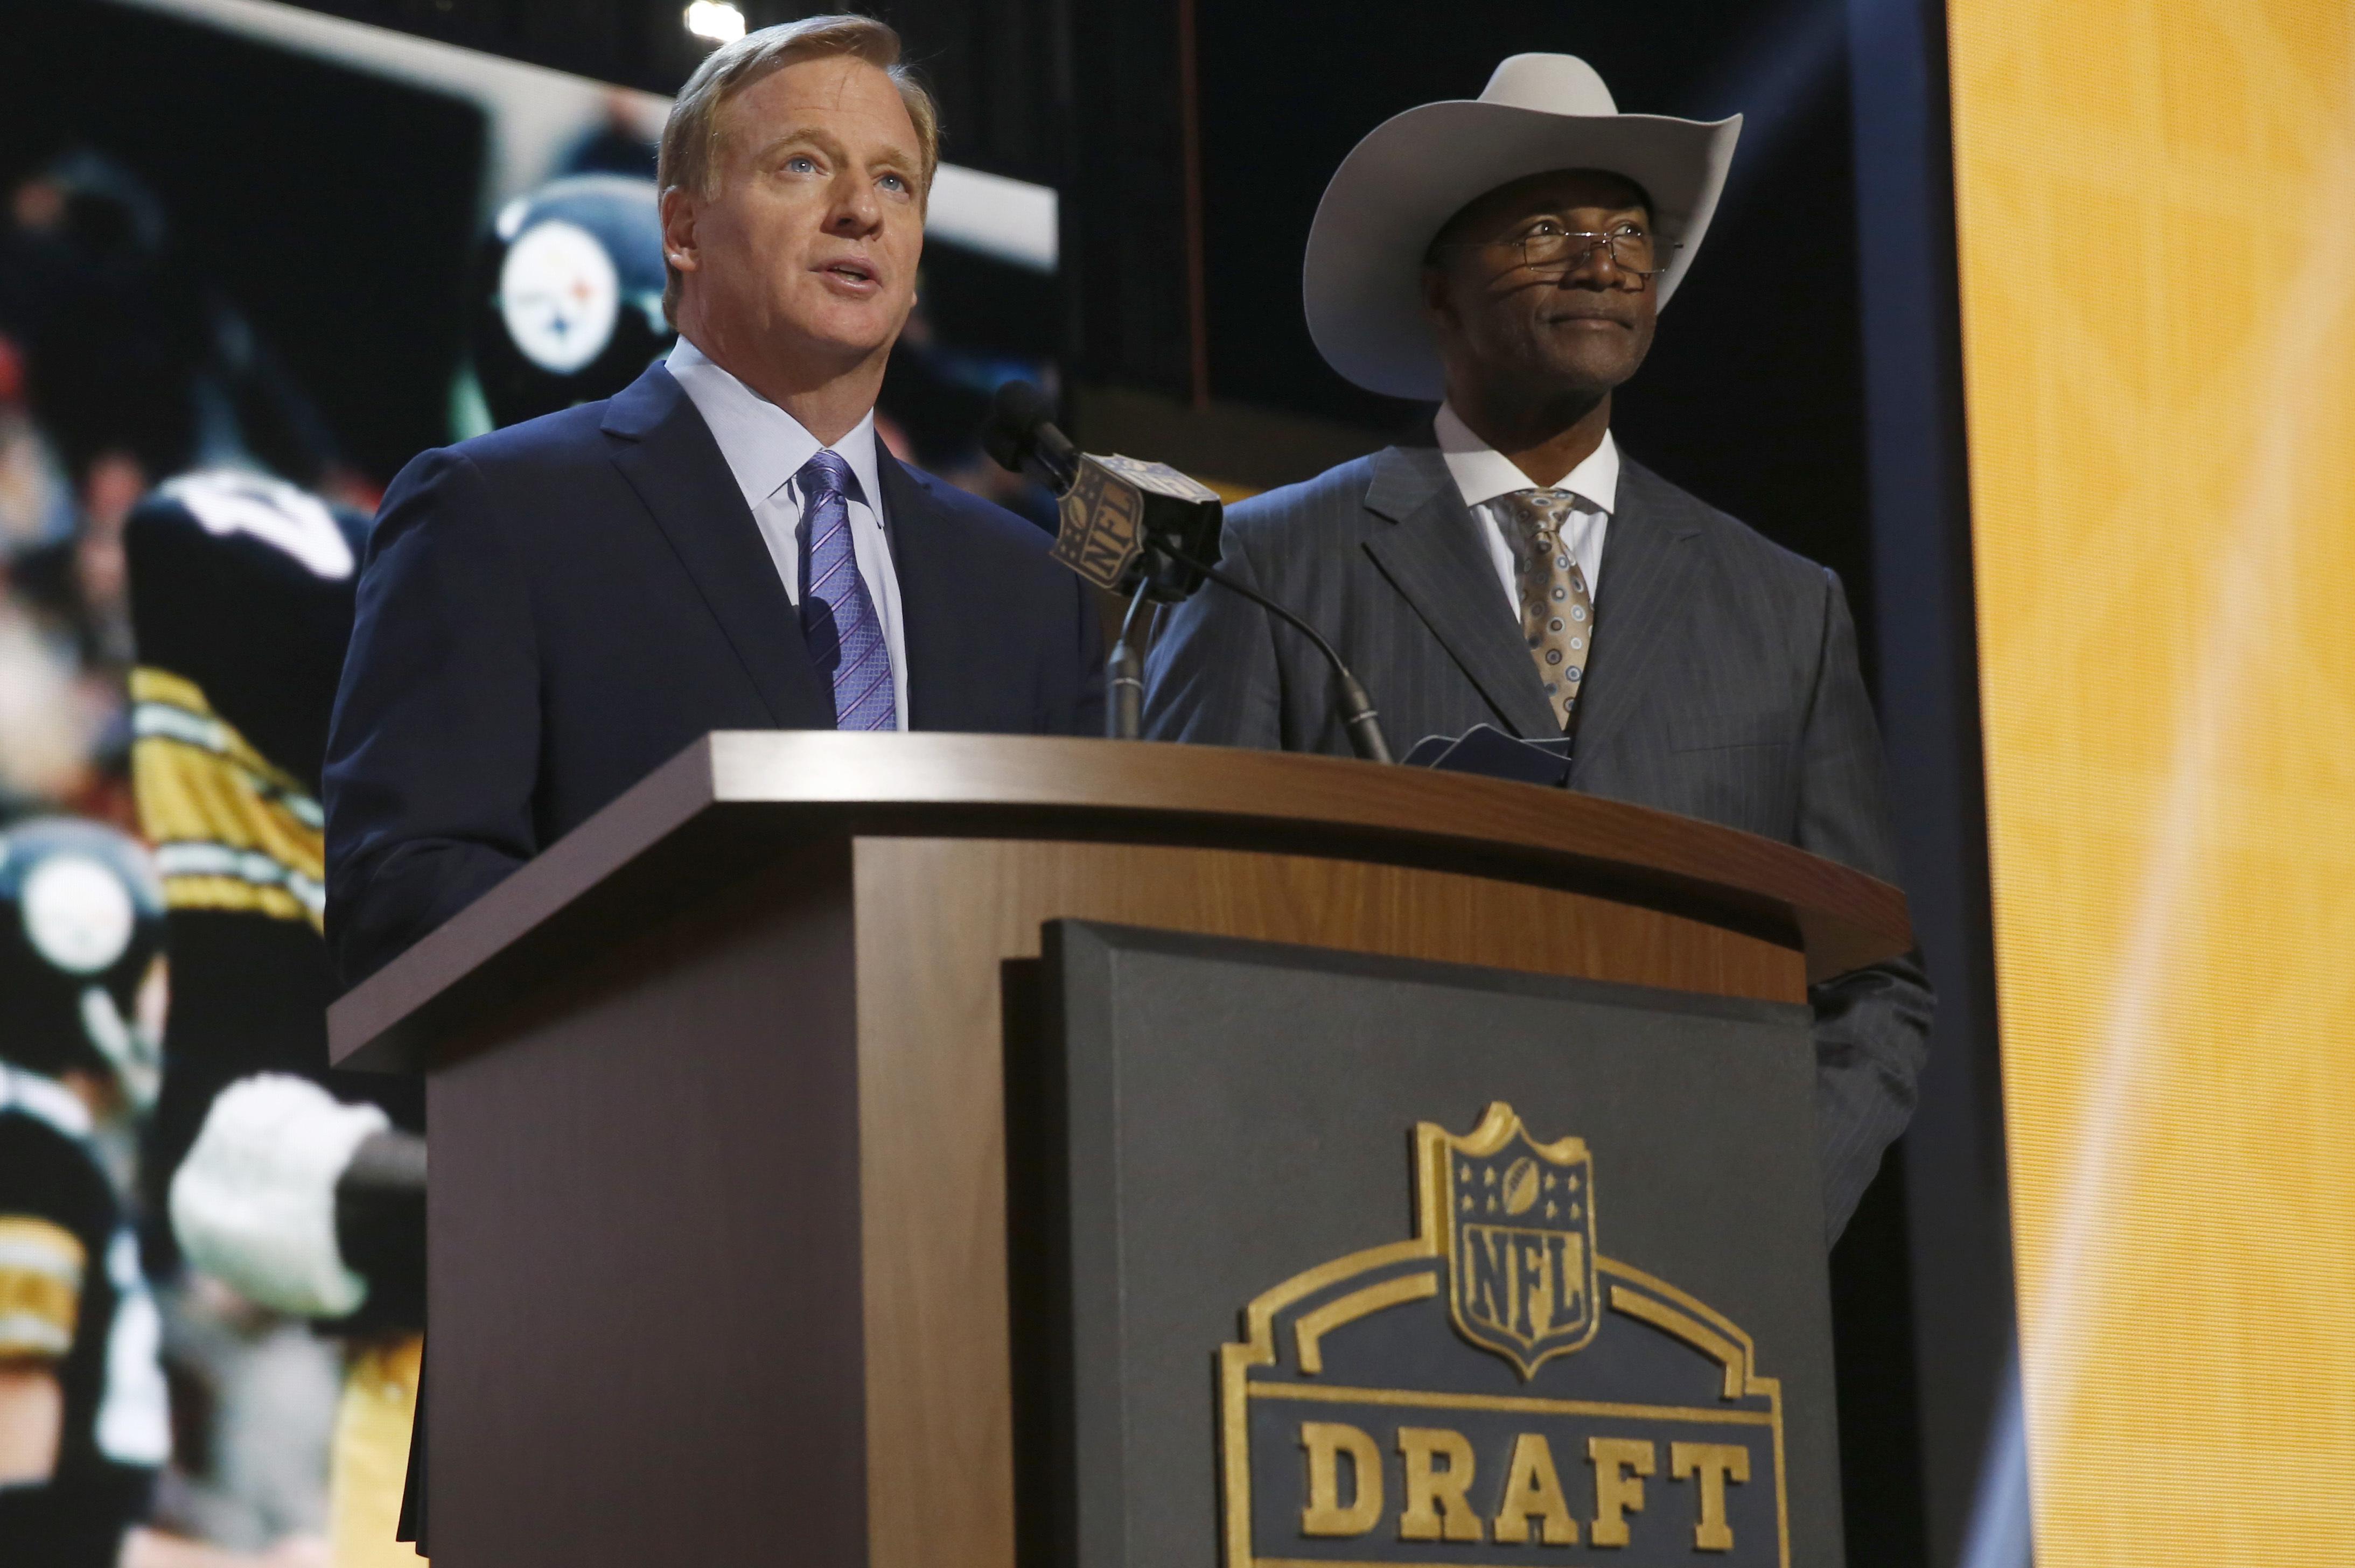 Cheap NFL Jerseys Sale - 2015 NFL Mock Draft: Updated Outlook for Rounds 4-7 | Bleacher Report